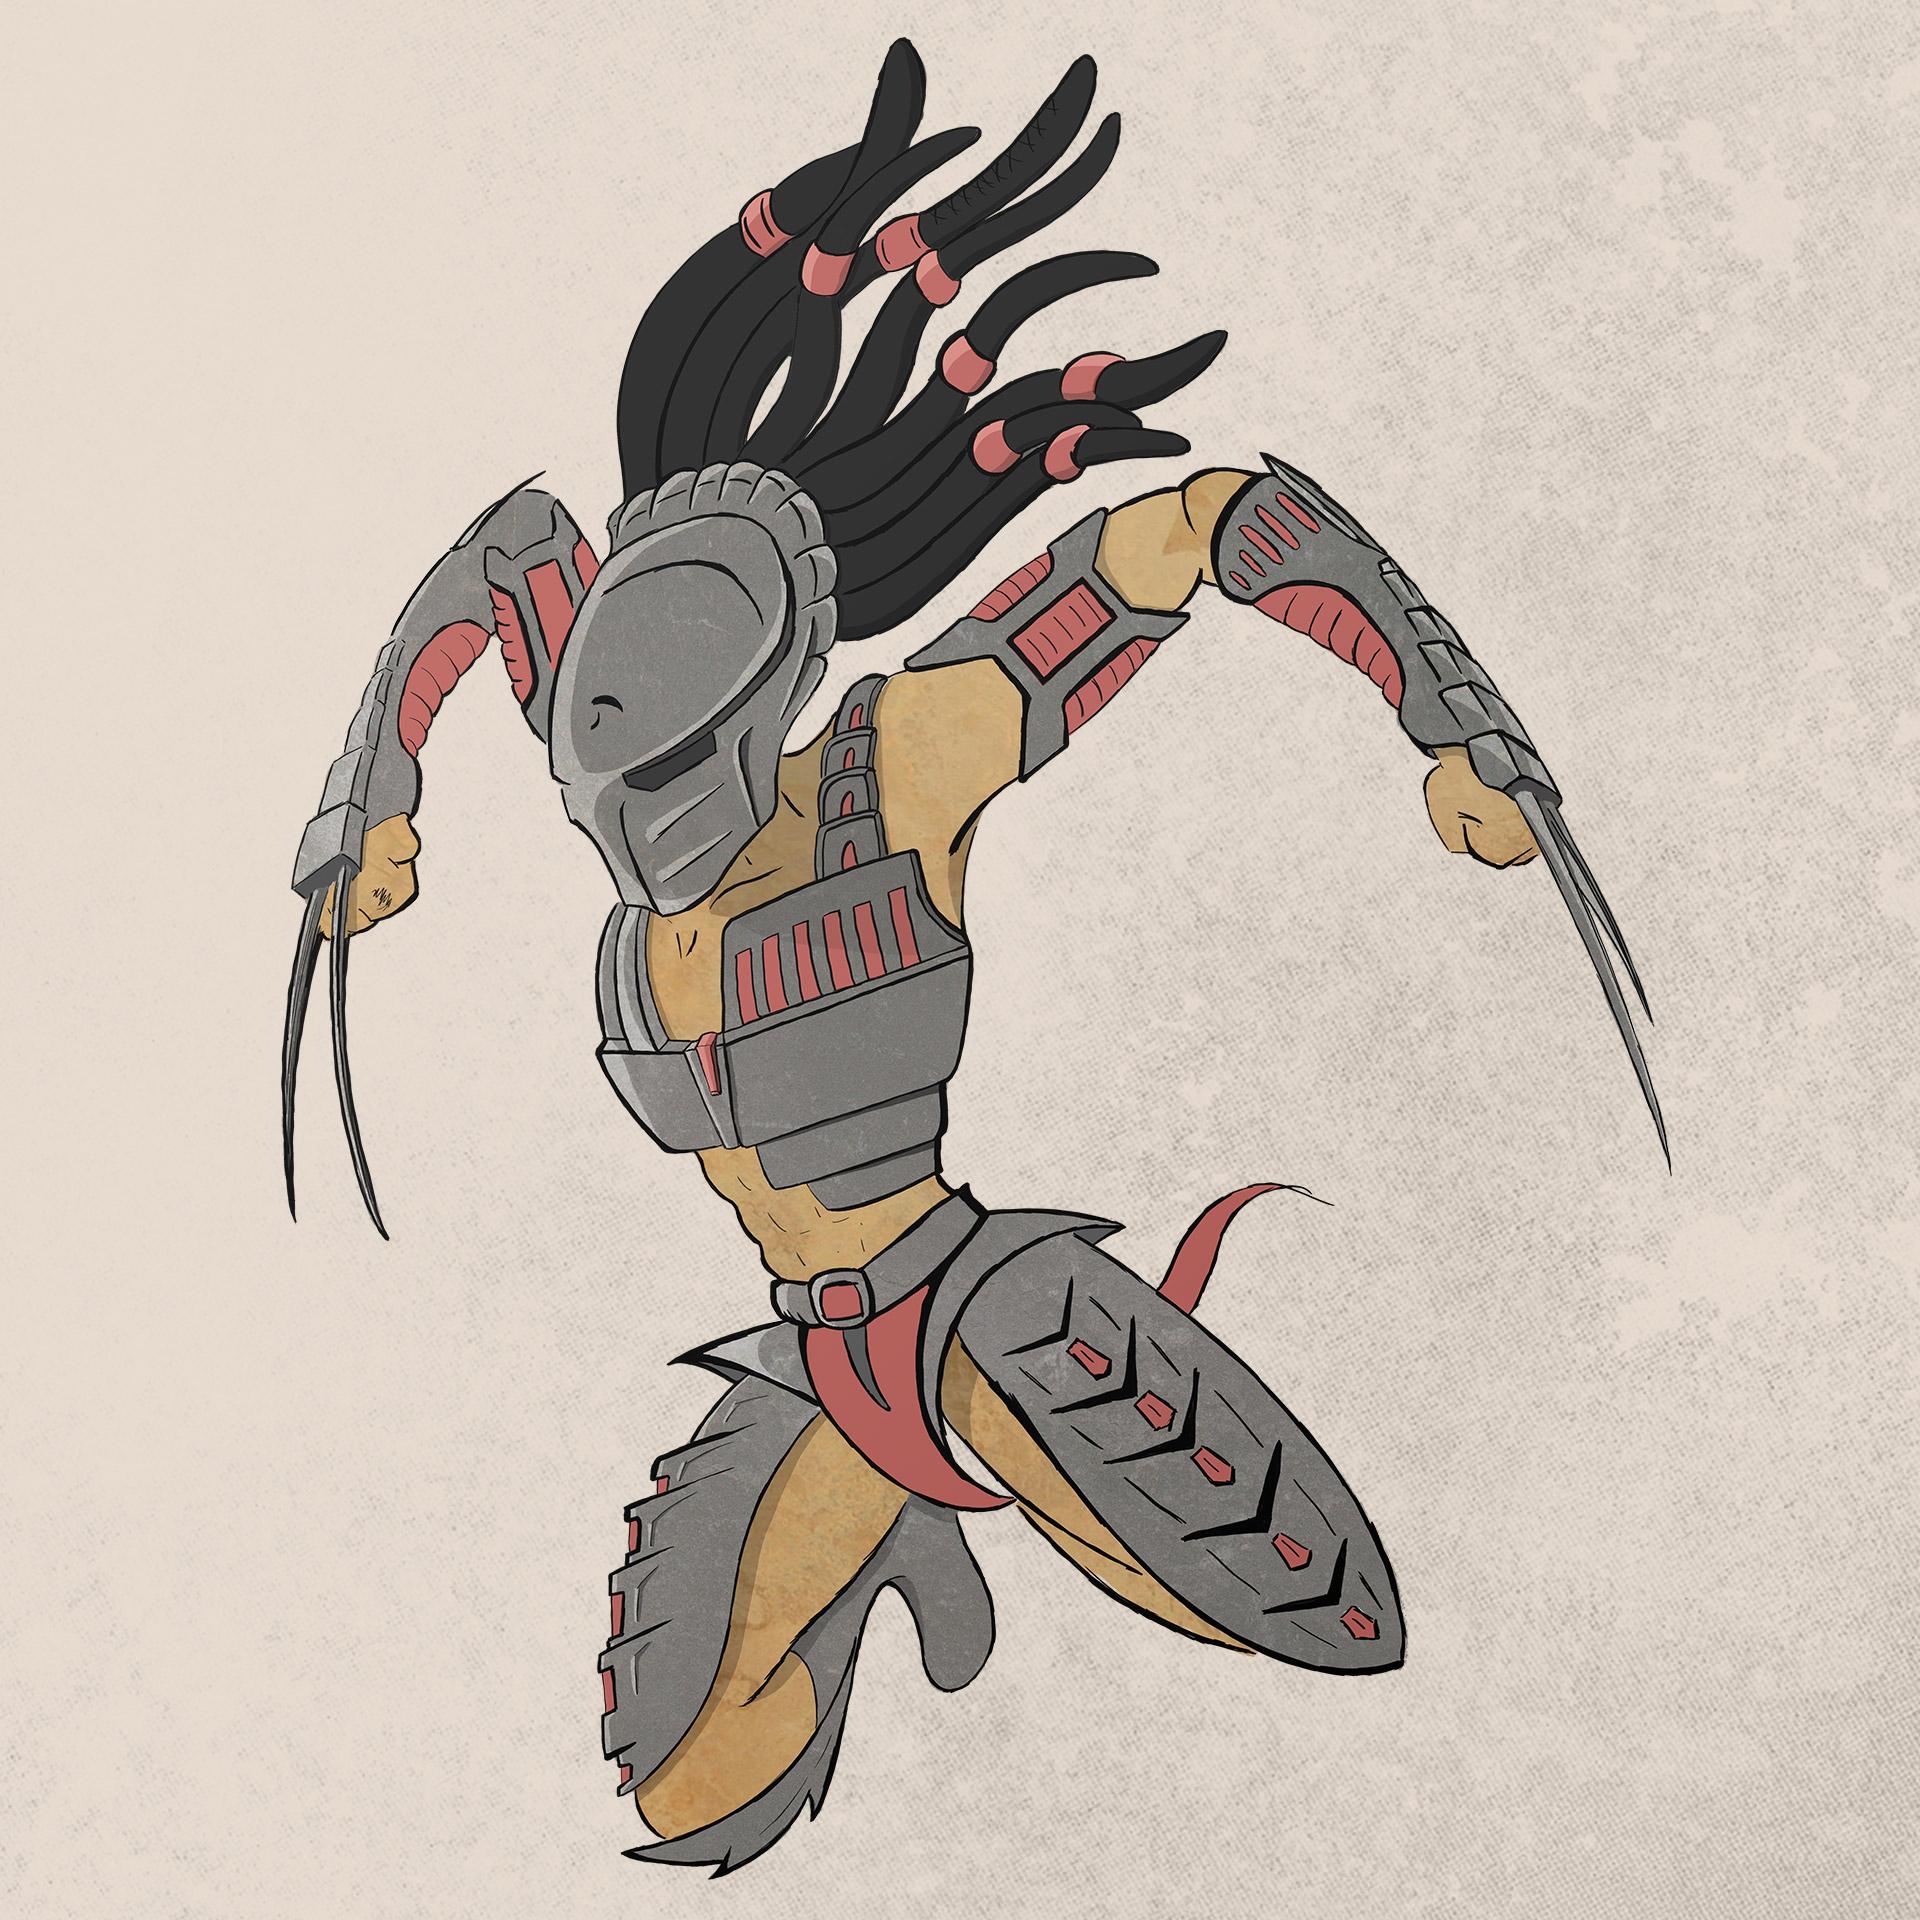 yautja-warrior-illustration-03b.jpg